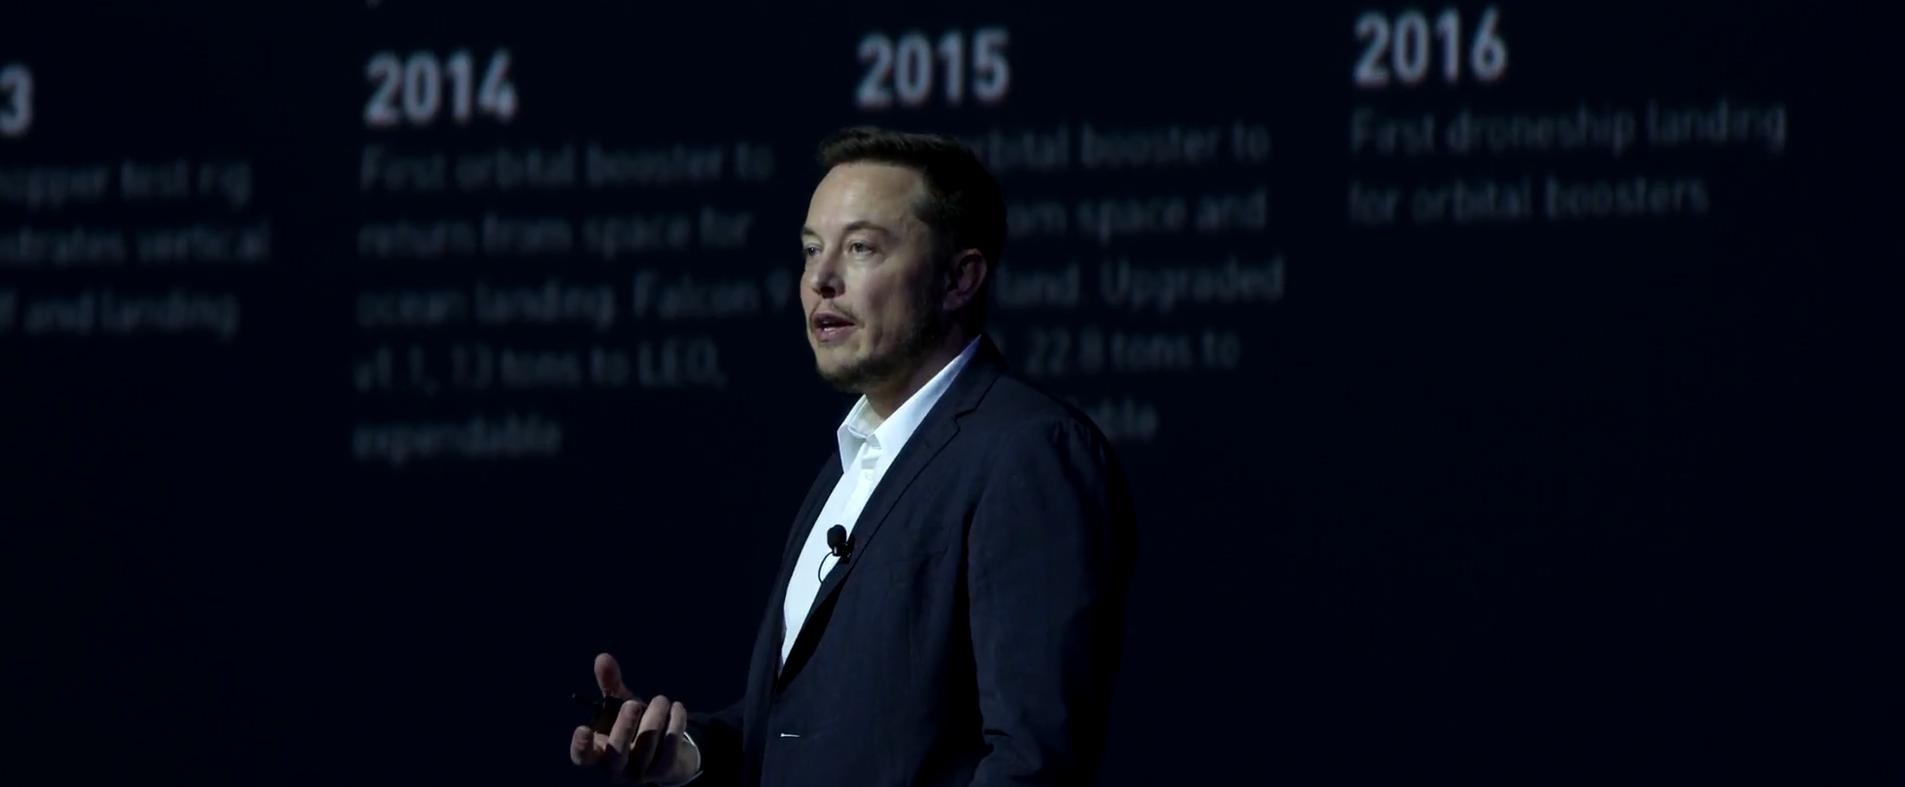 CEO Tesly Elon Musk